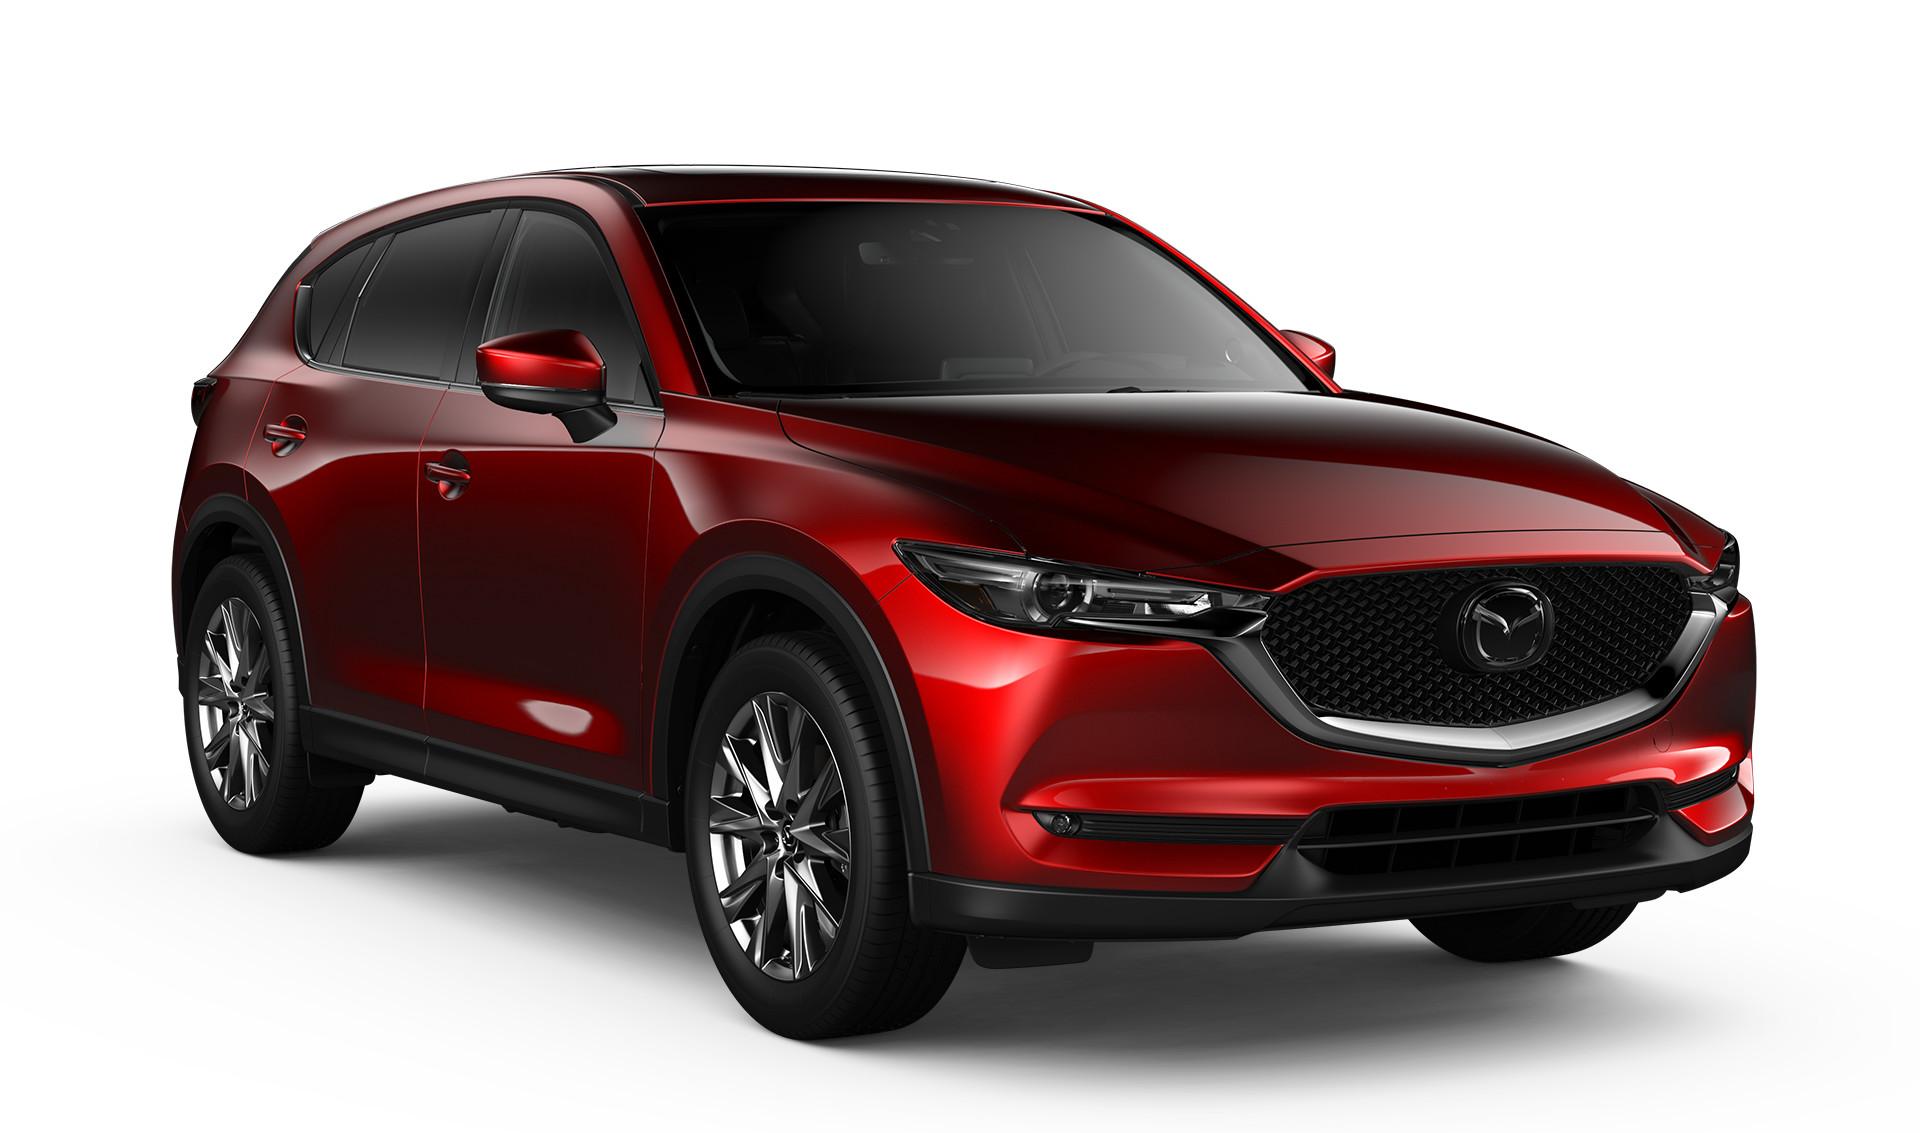 2020 Mazda CX-5 for sale in Edmonton, AB